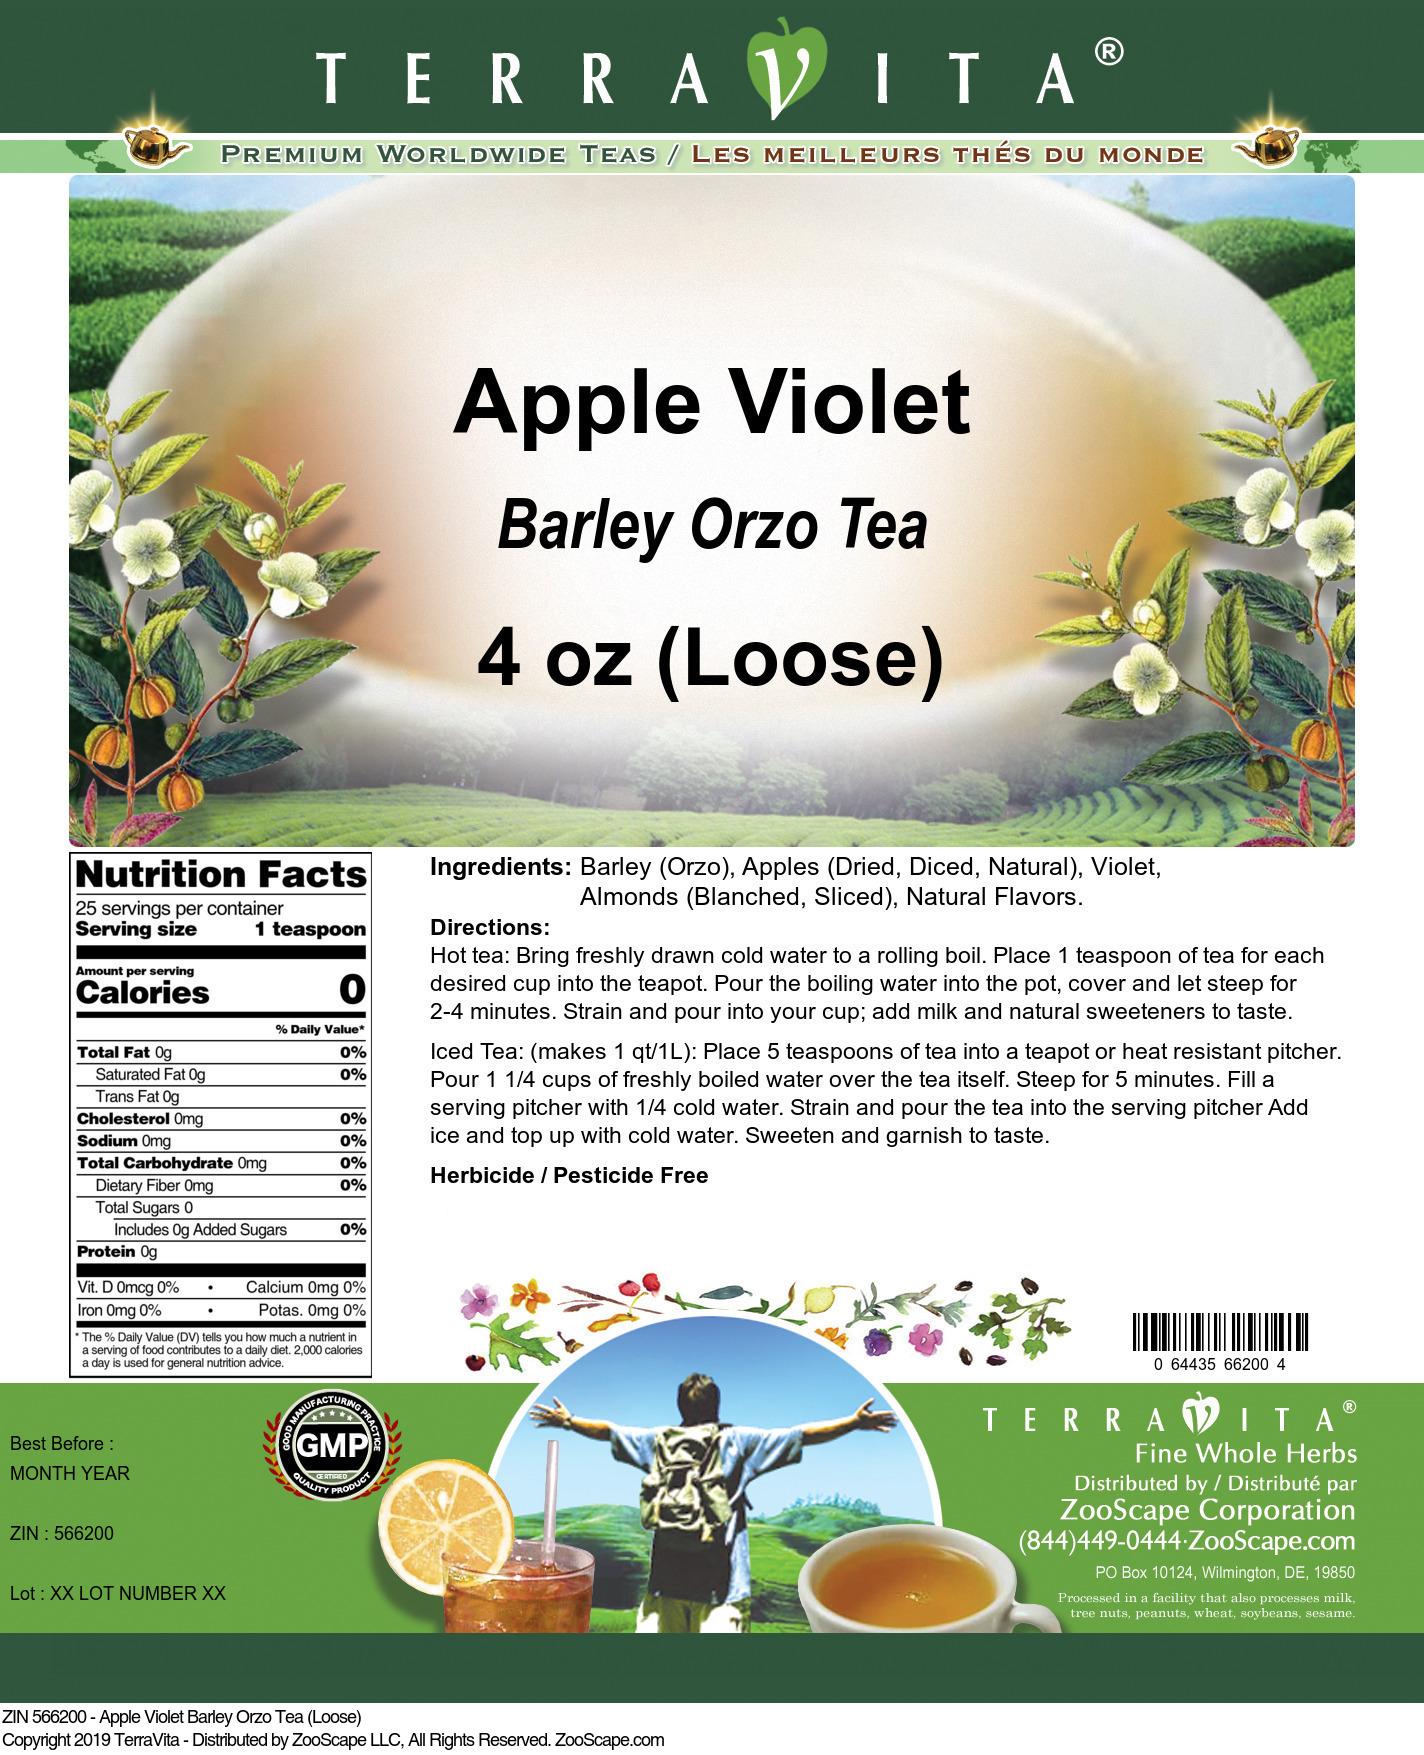 Apple Violet Barley Orzo Tea (Loose)